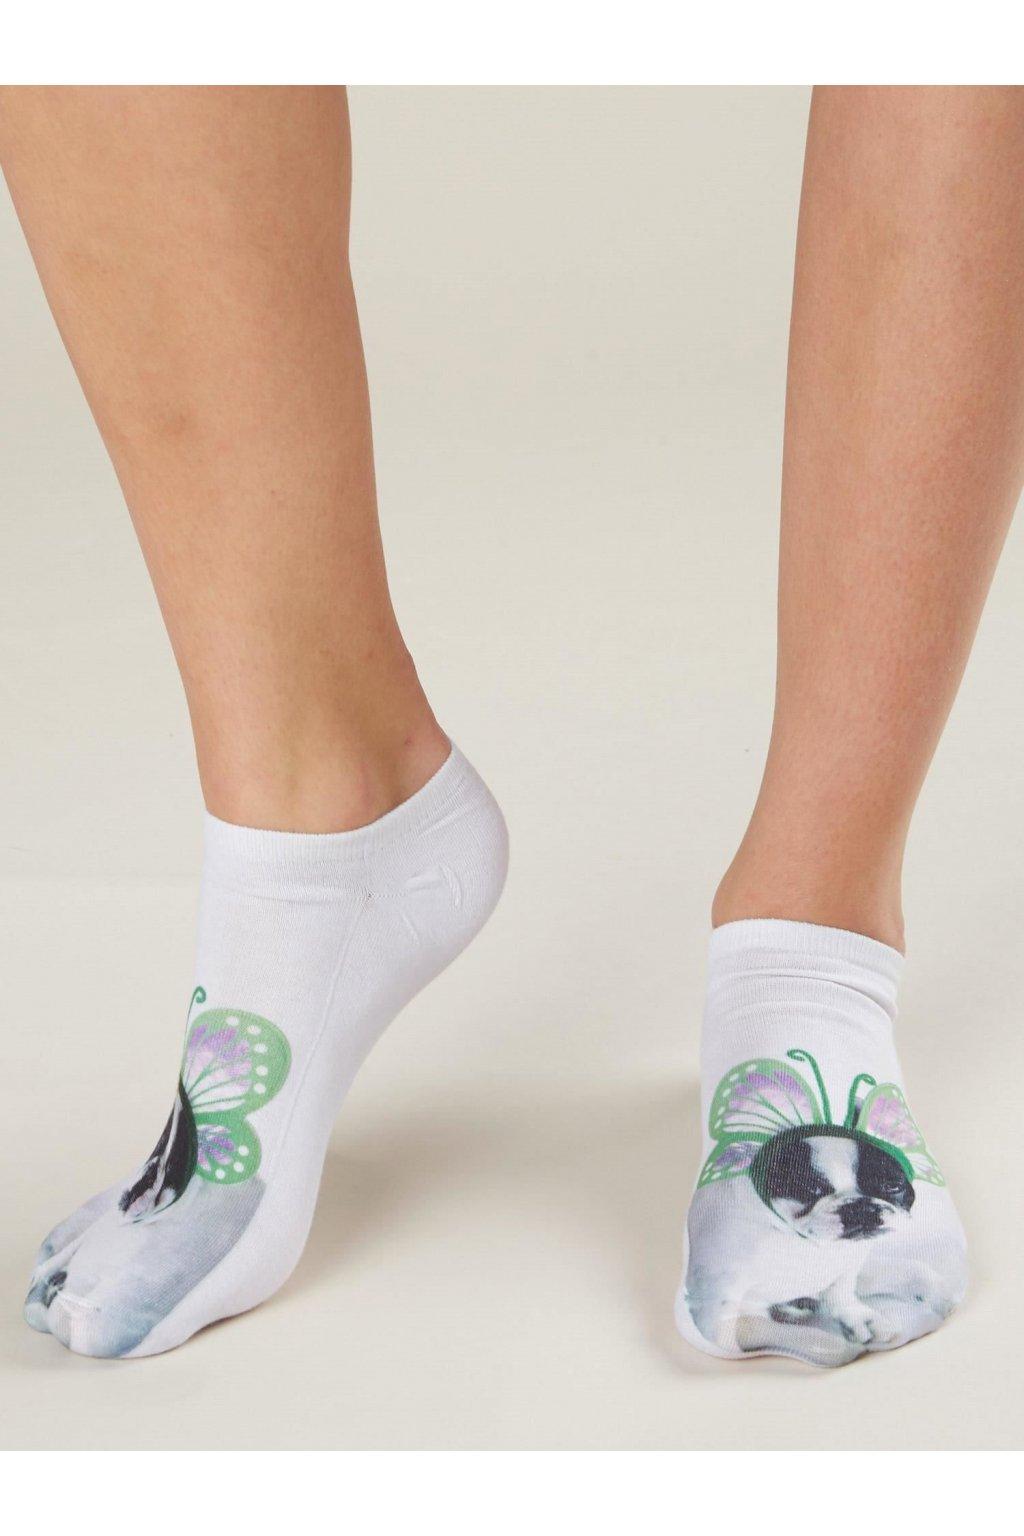 Dámske ponožky kód 7-SR-PWF-01593-6